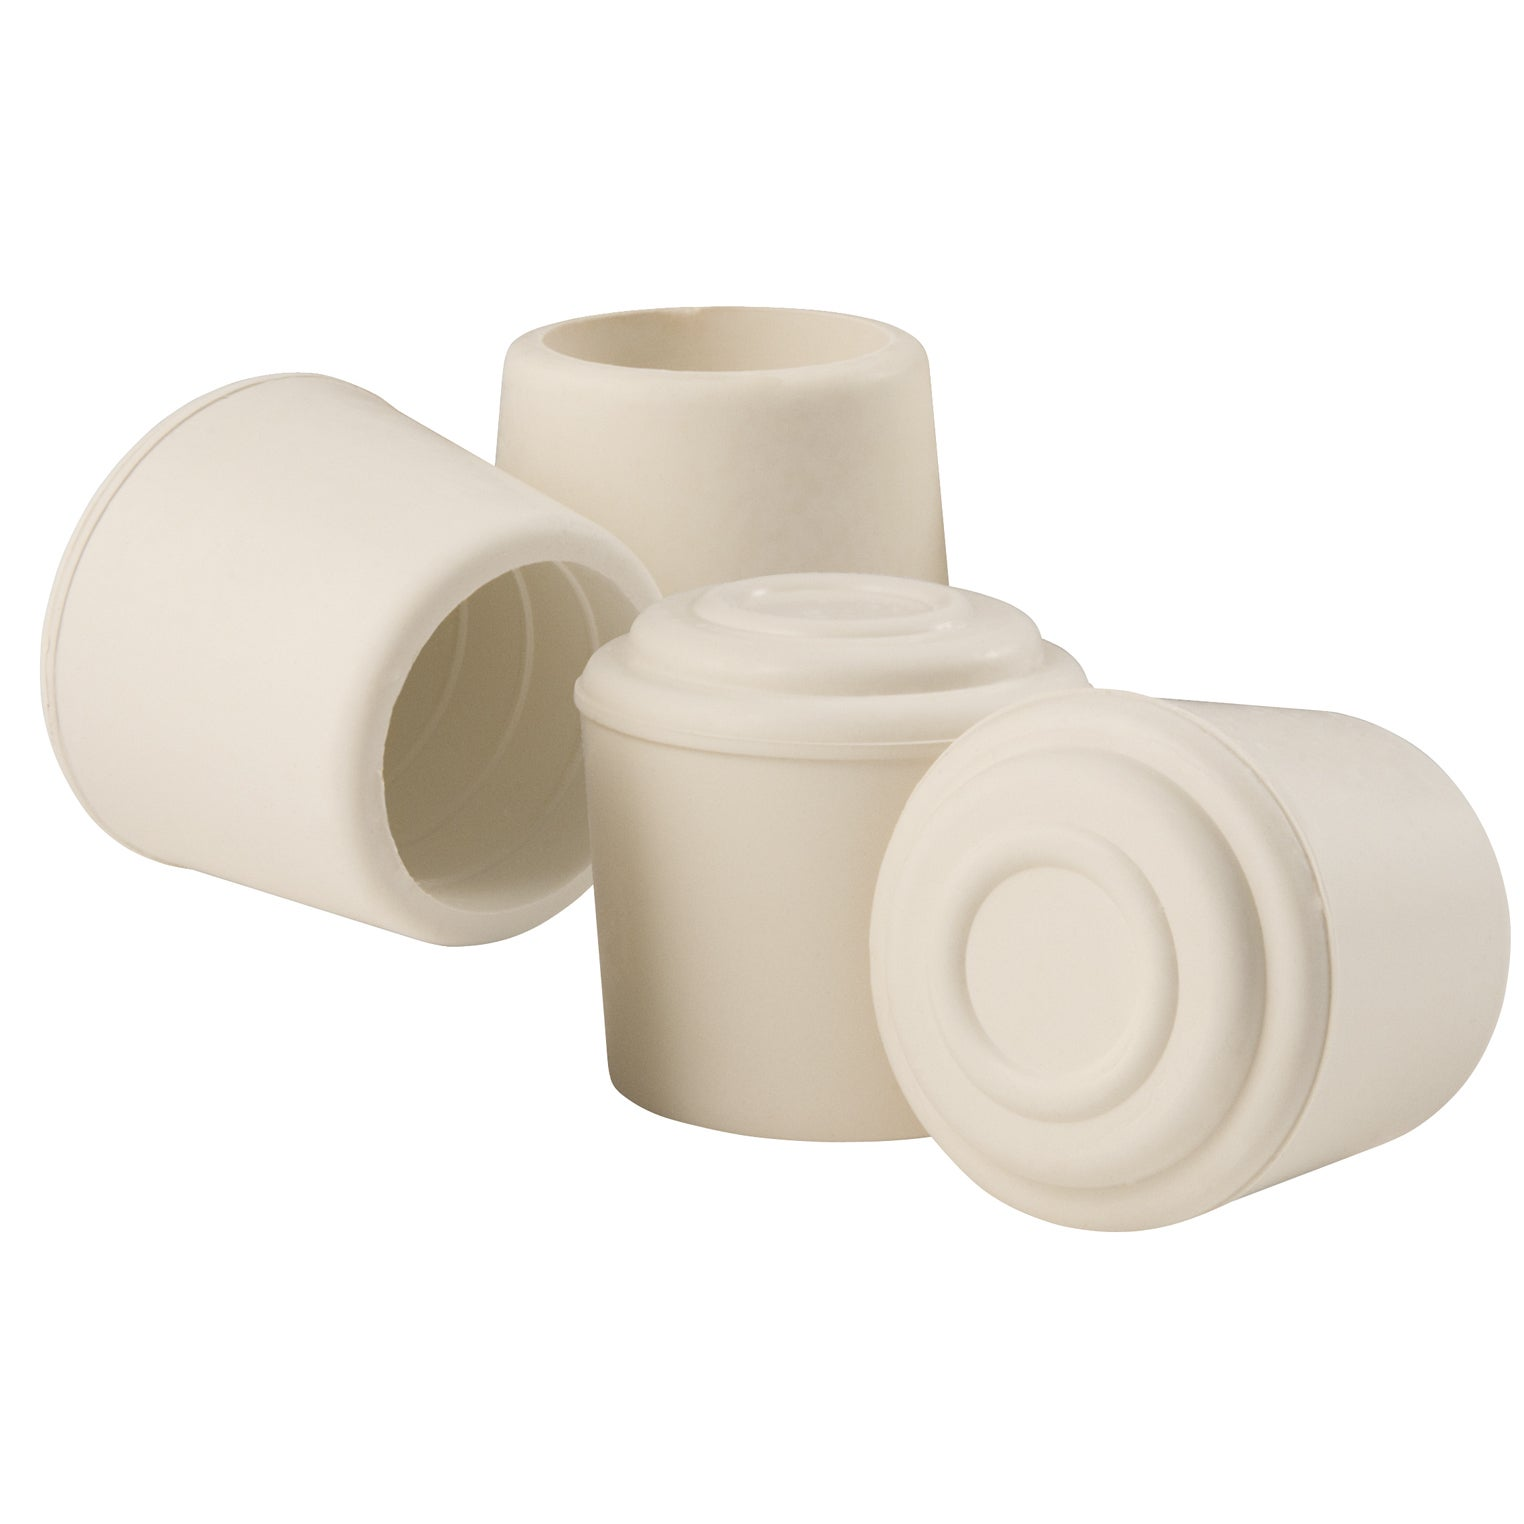 "Waxman Consumer Group 4441495NJ 3/4"" Rubber Tip 4-ct (Har..."